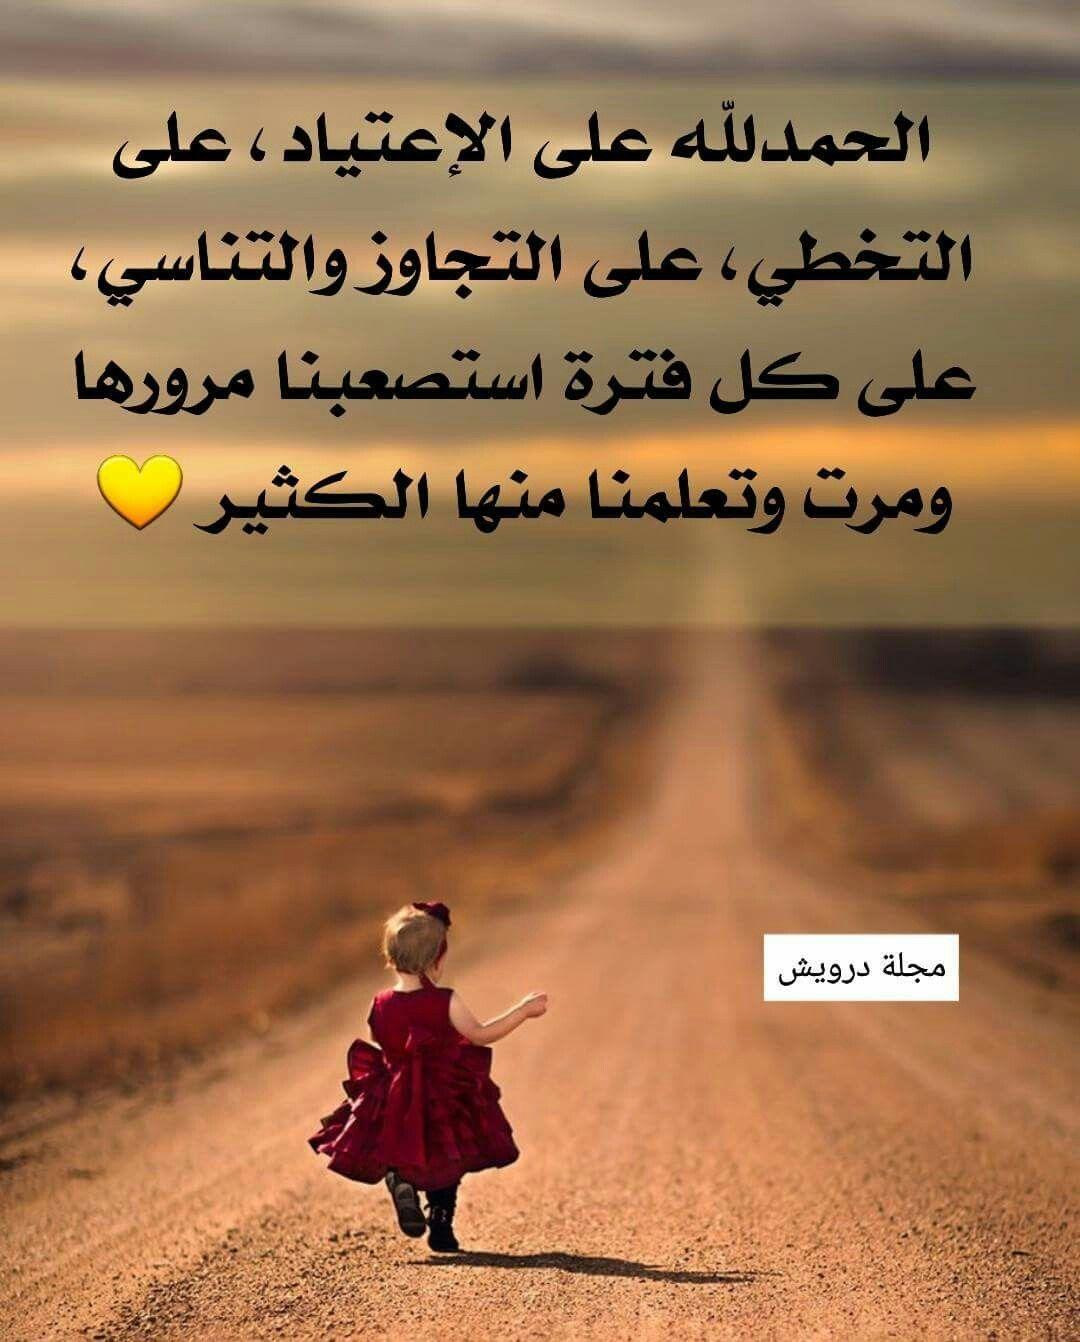 الحمد لله Arabic Quotes Inspirational Words Life Quotes